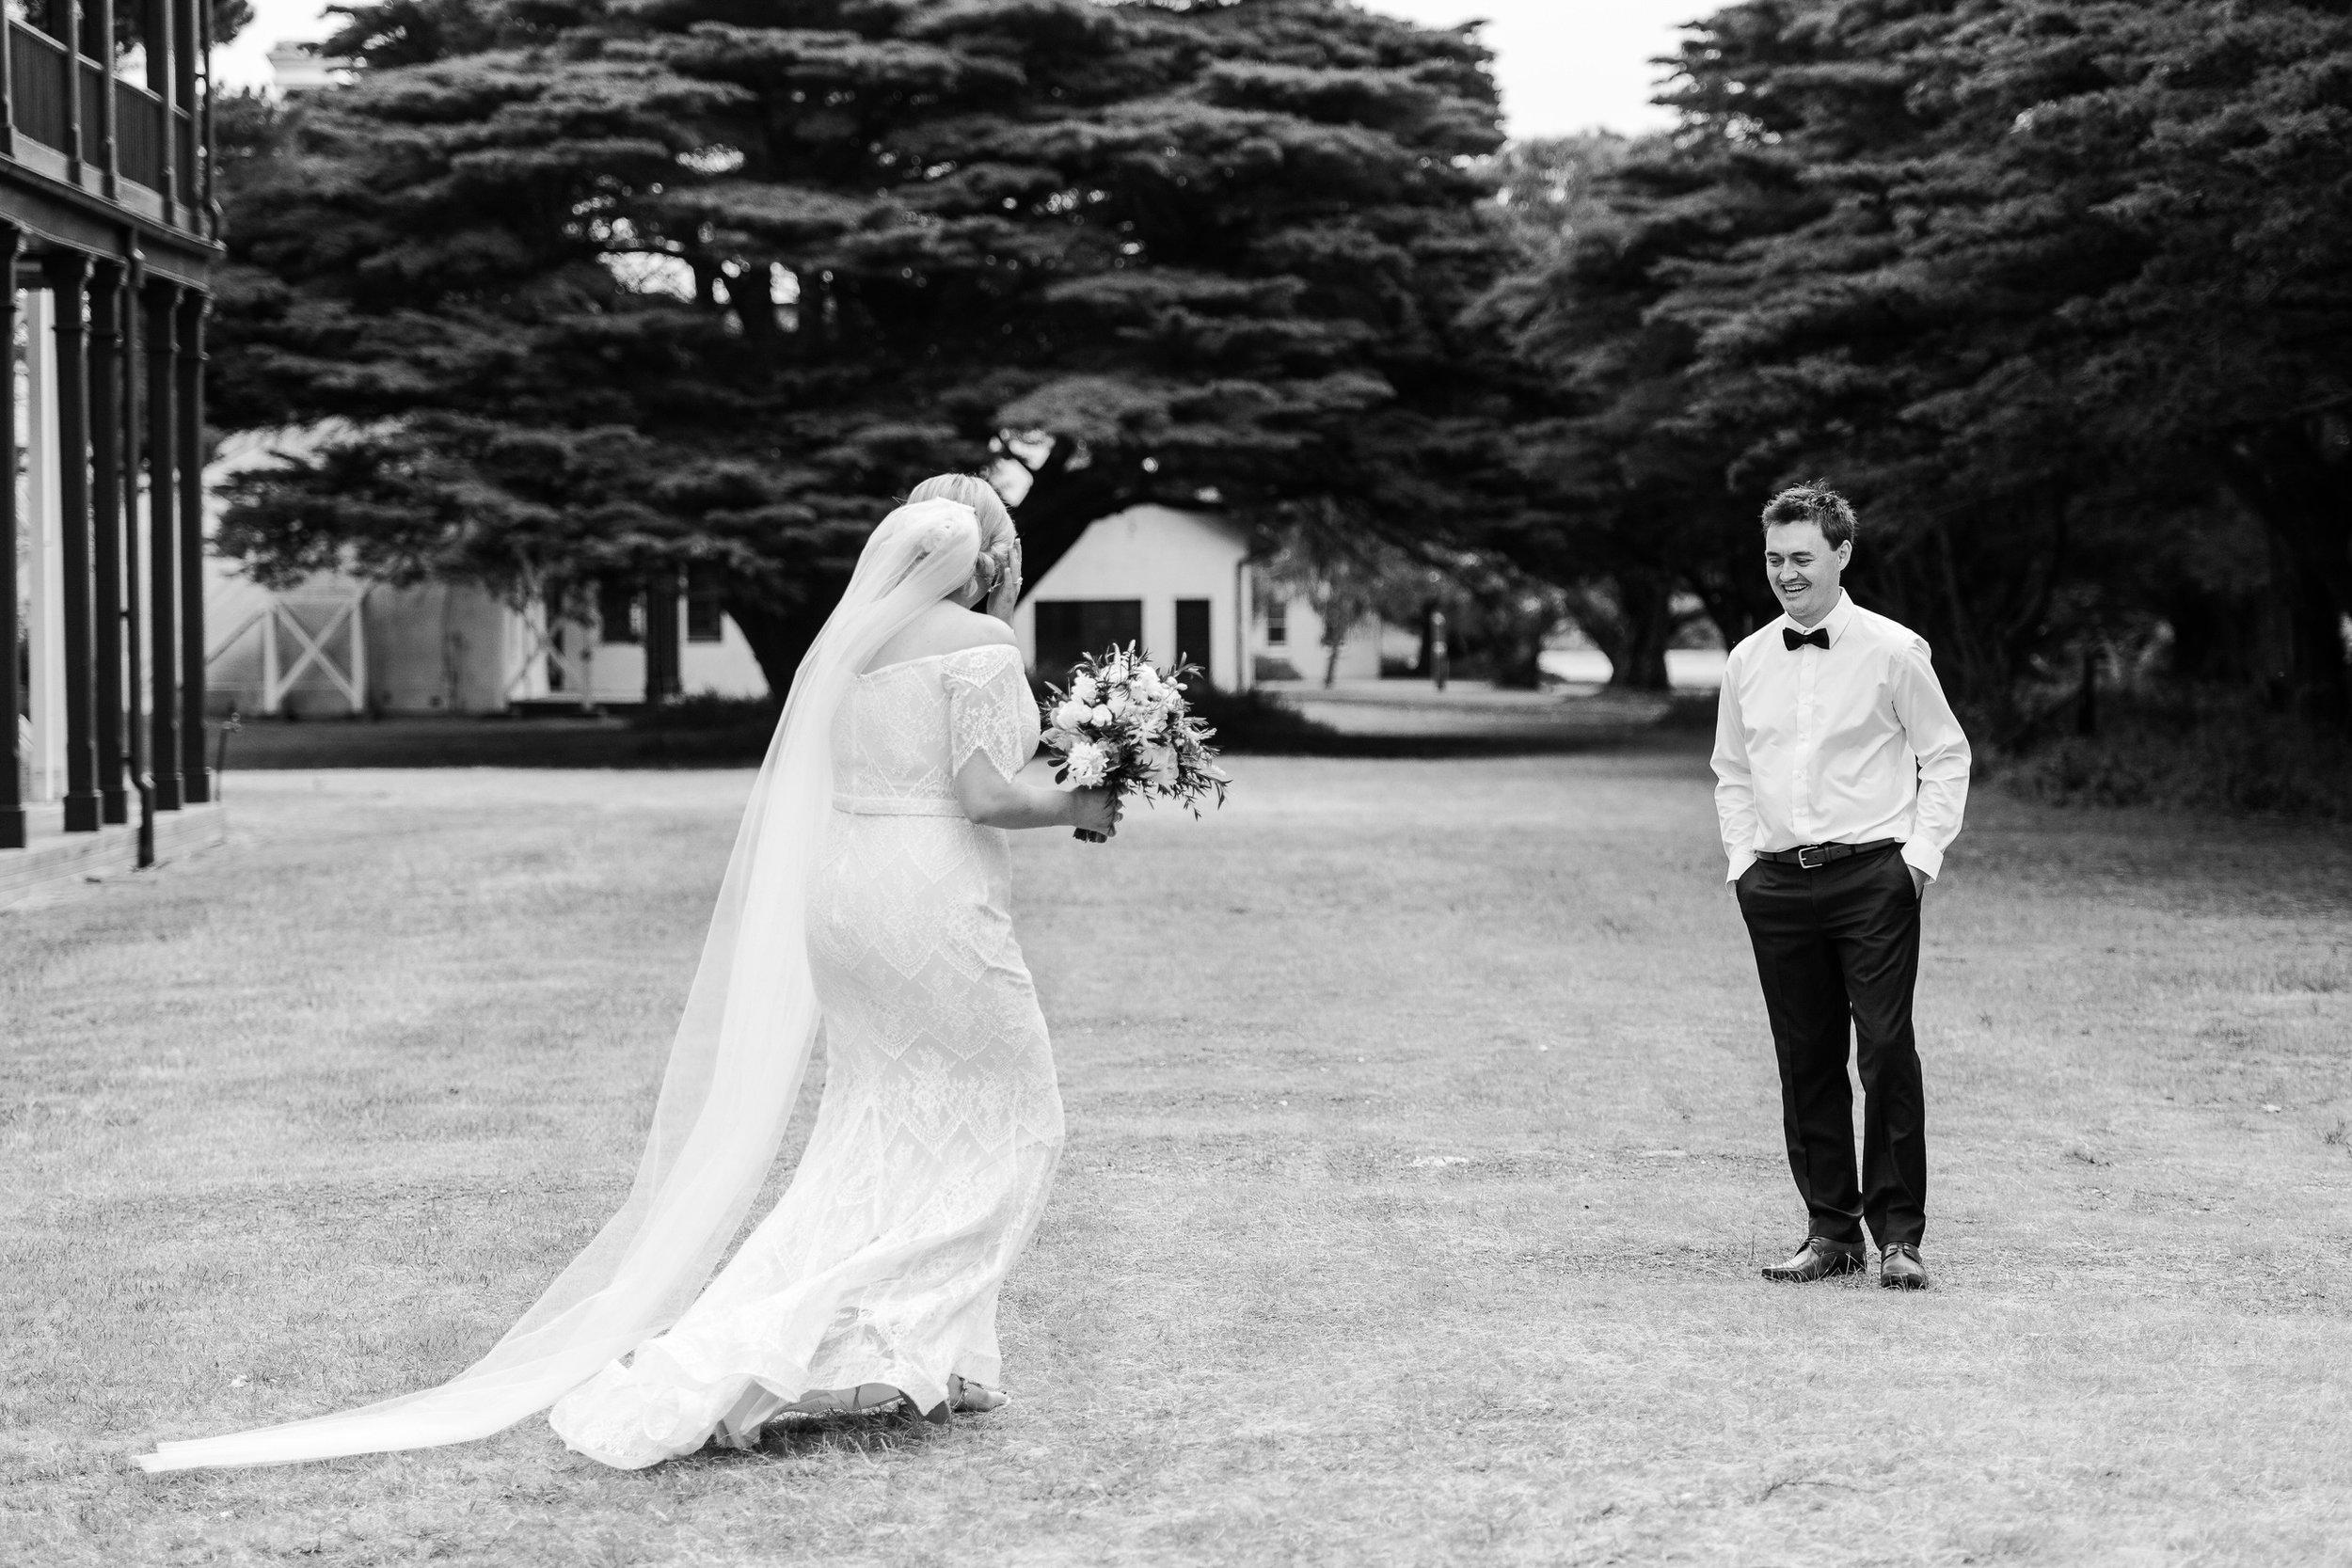 Justin_And_Jim_Photography_Portsea_Pub_Wedding37.JPG